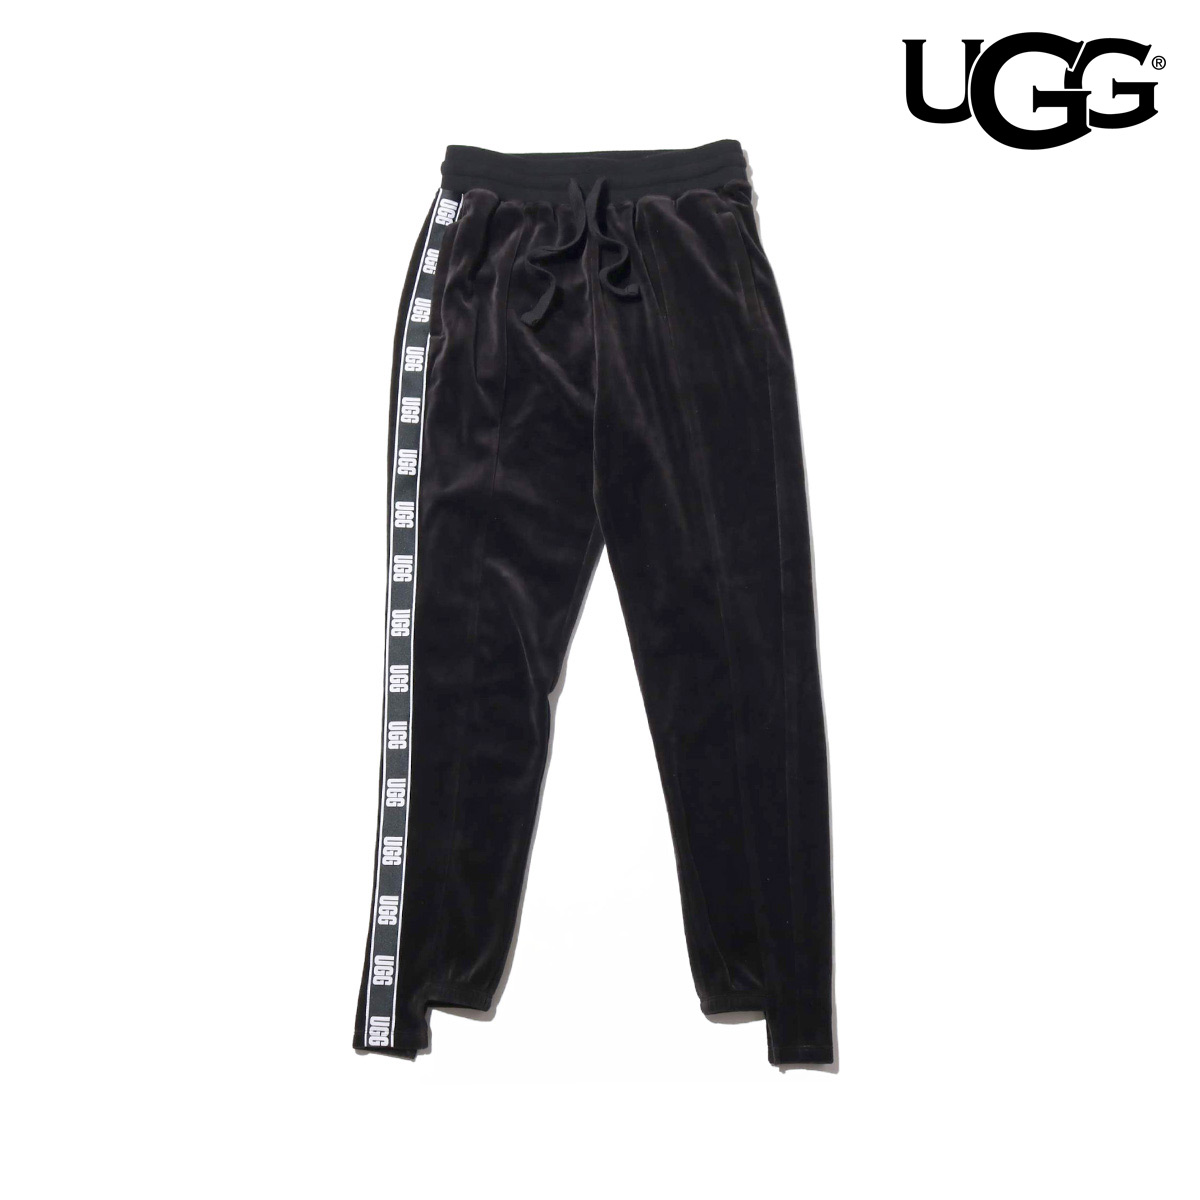 UGG Iris Track Pant(BLACK)(アグ アイリス トラック パンツ)【レディース】【パンツ】【18FW-I】